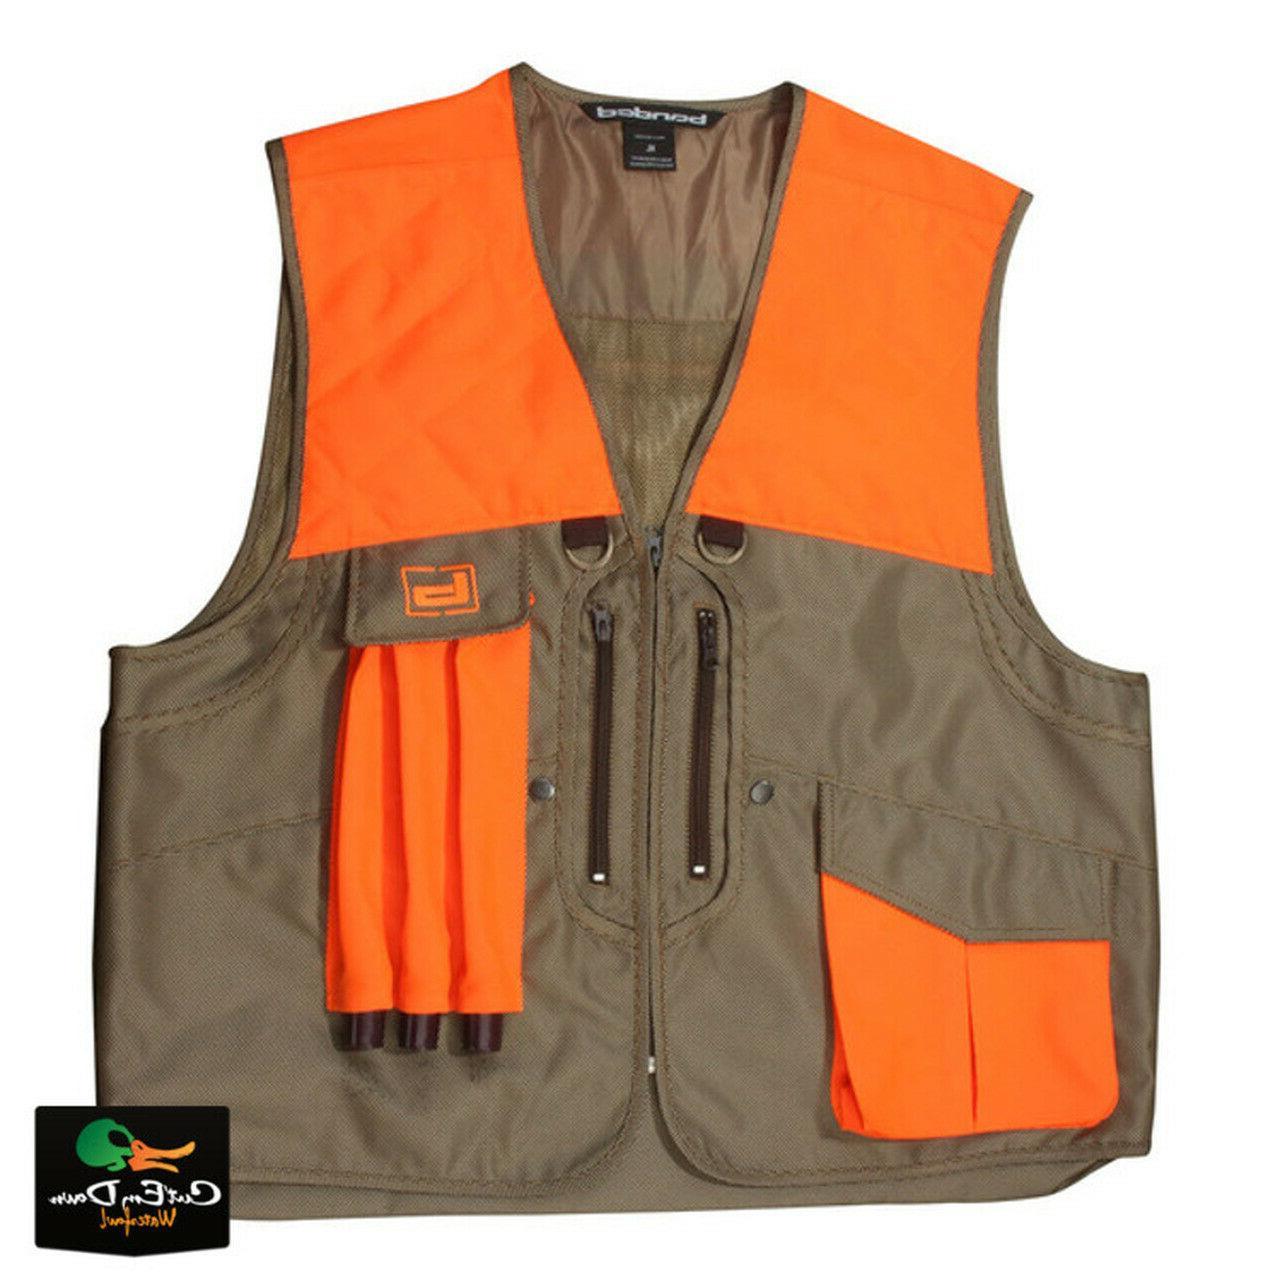 new gear big stone oxford vest upland